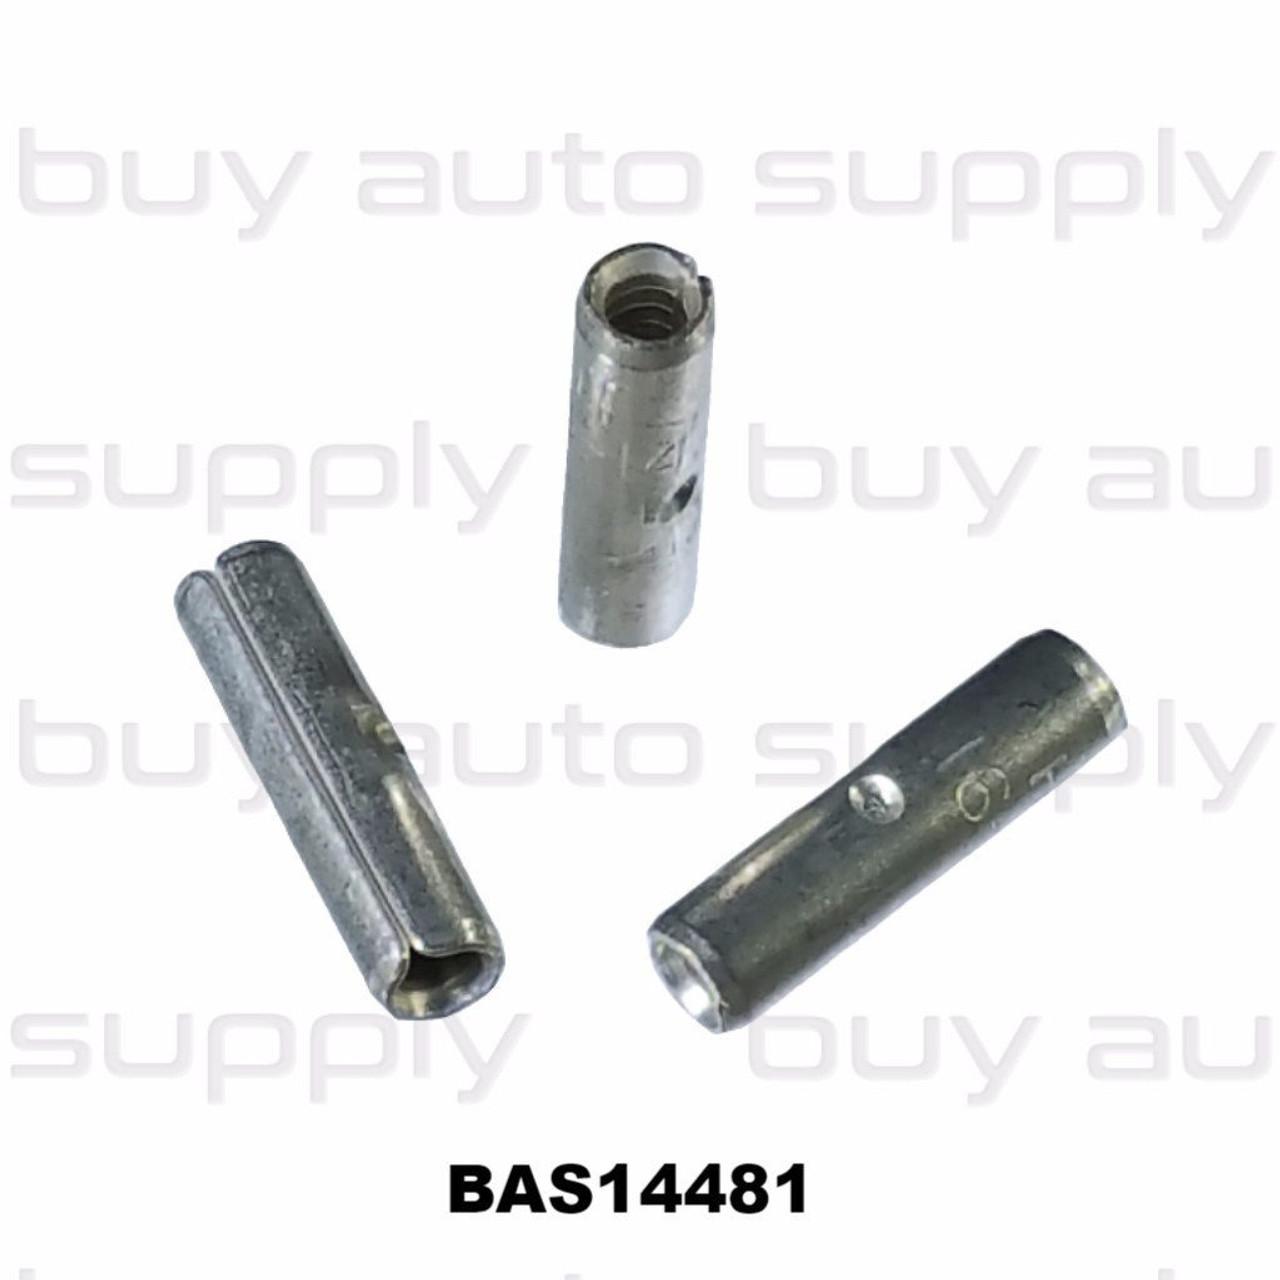 Butt Connectors - 16-14 Non-Insulated - BAS14481